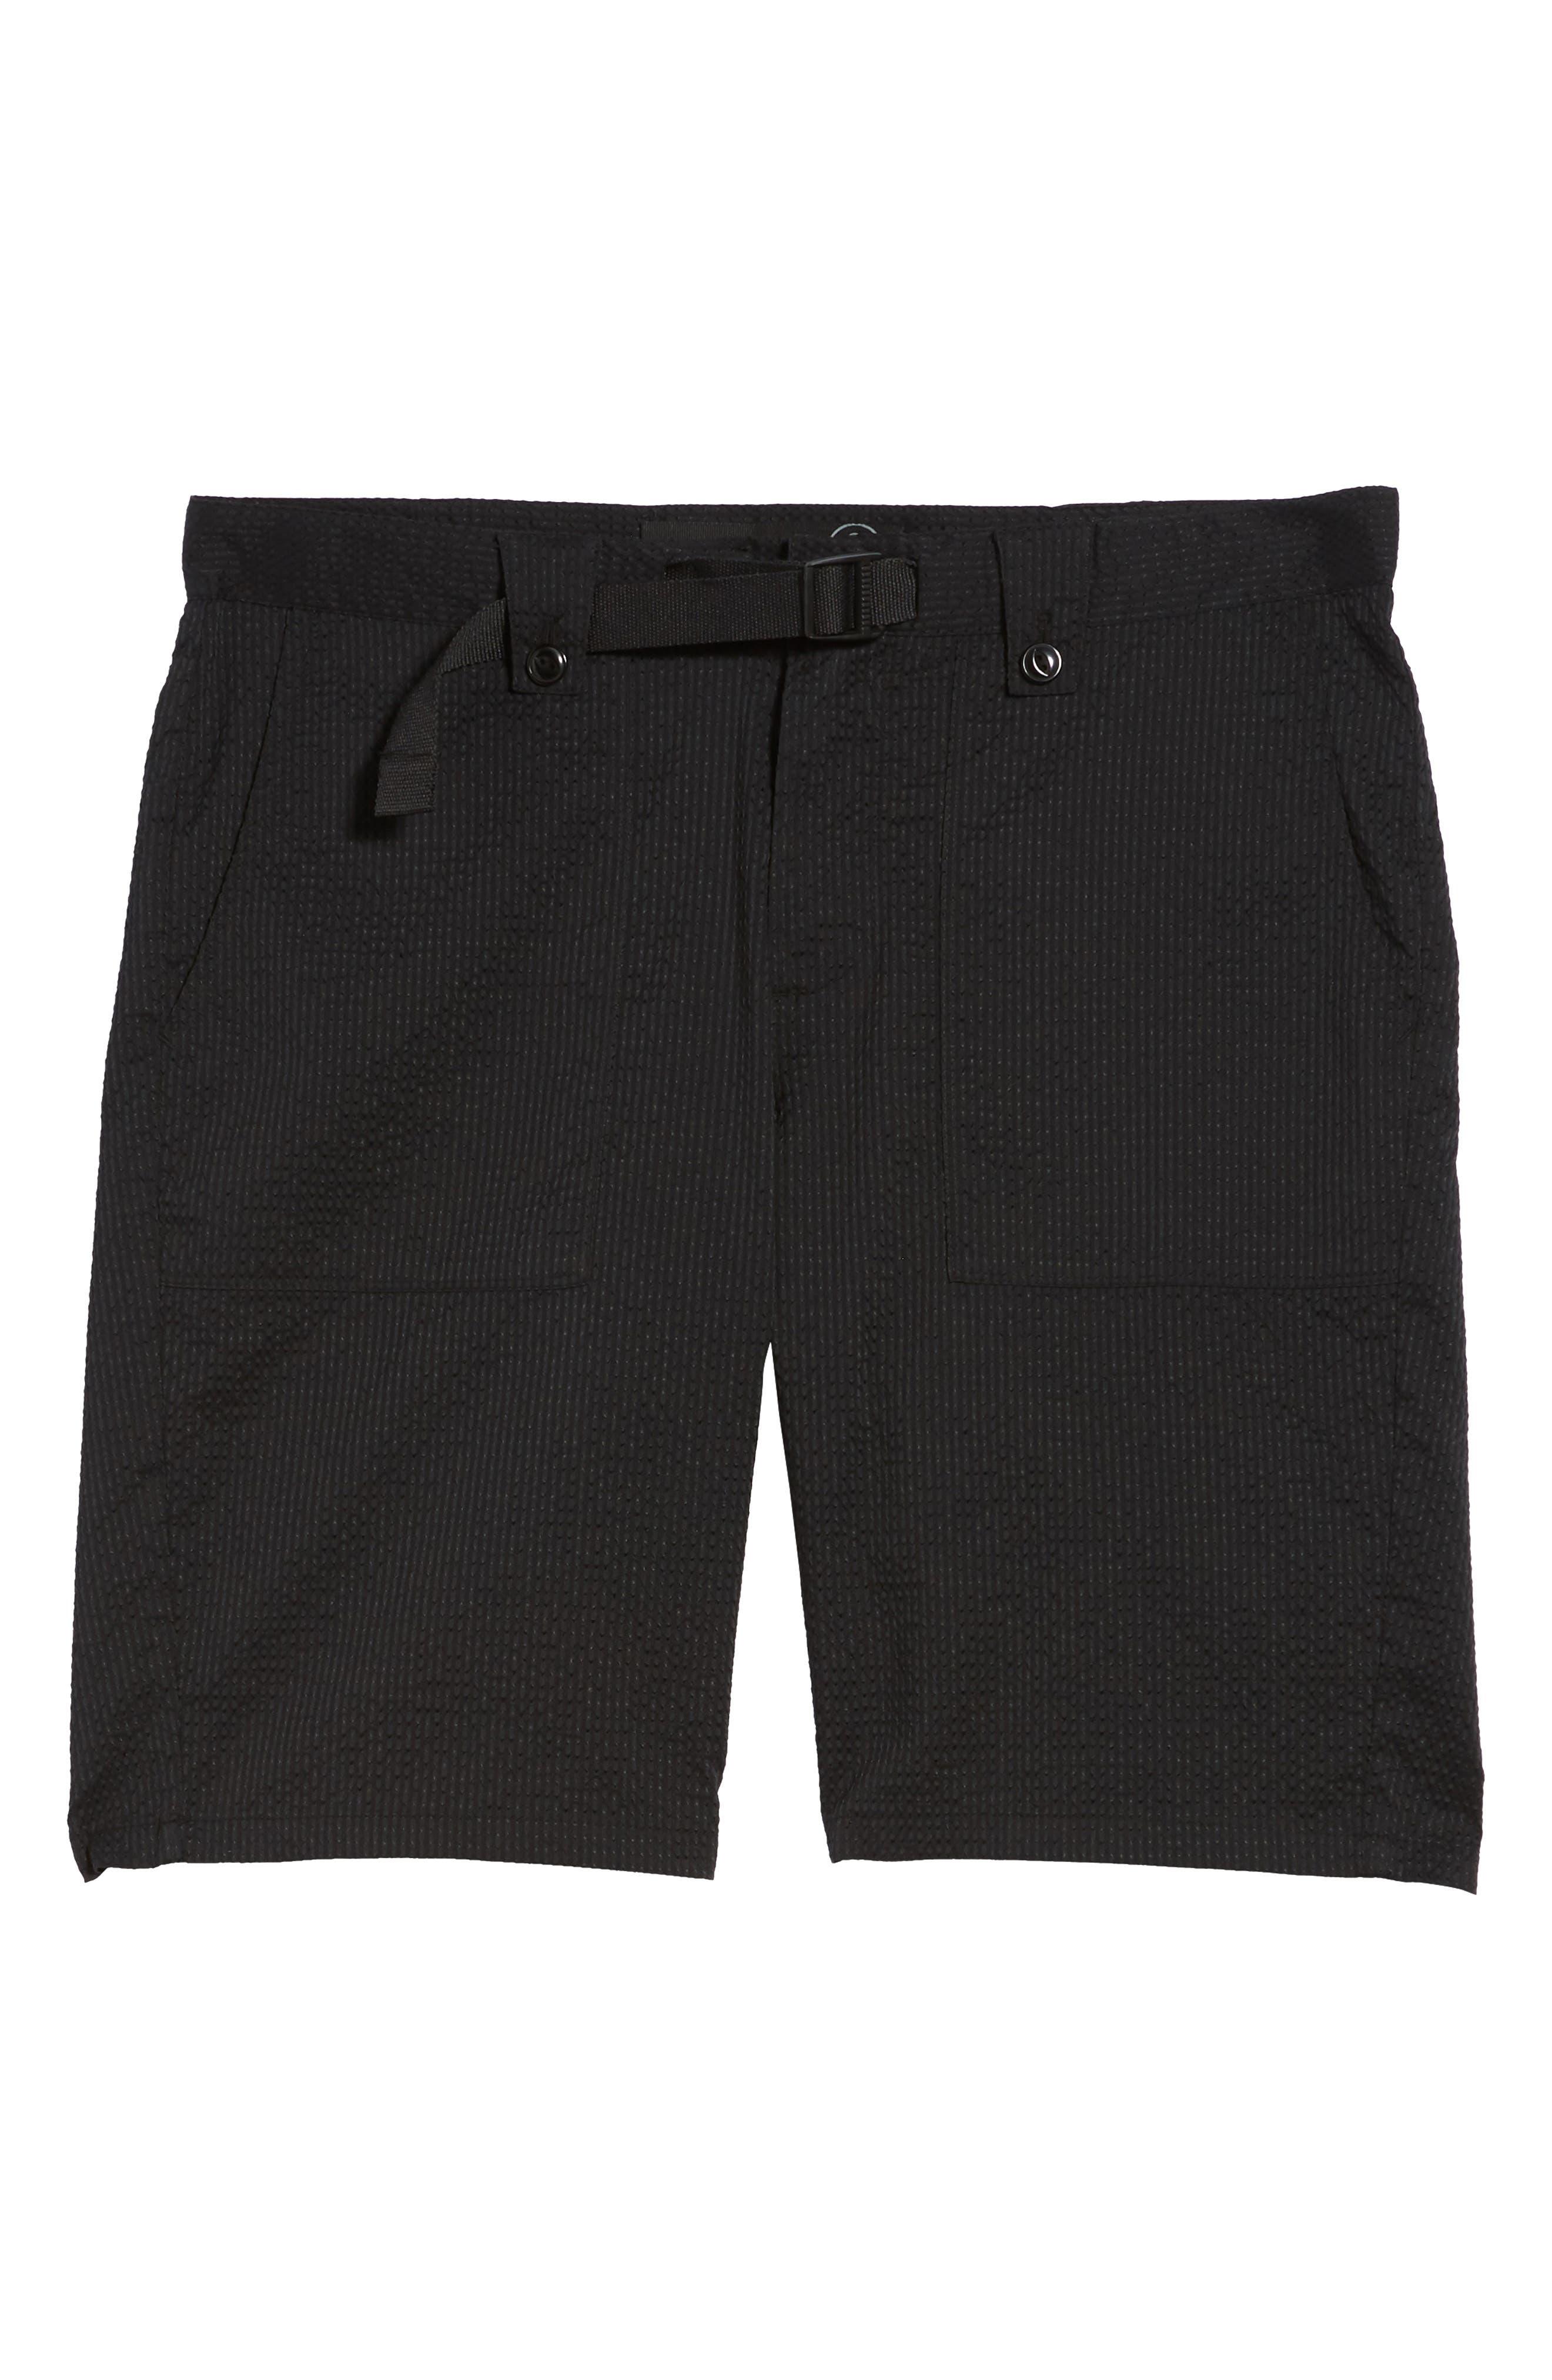 Utility Seersucker Shorts,                             Alternate thumbnail 6, color,